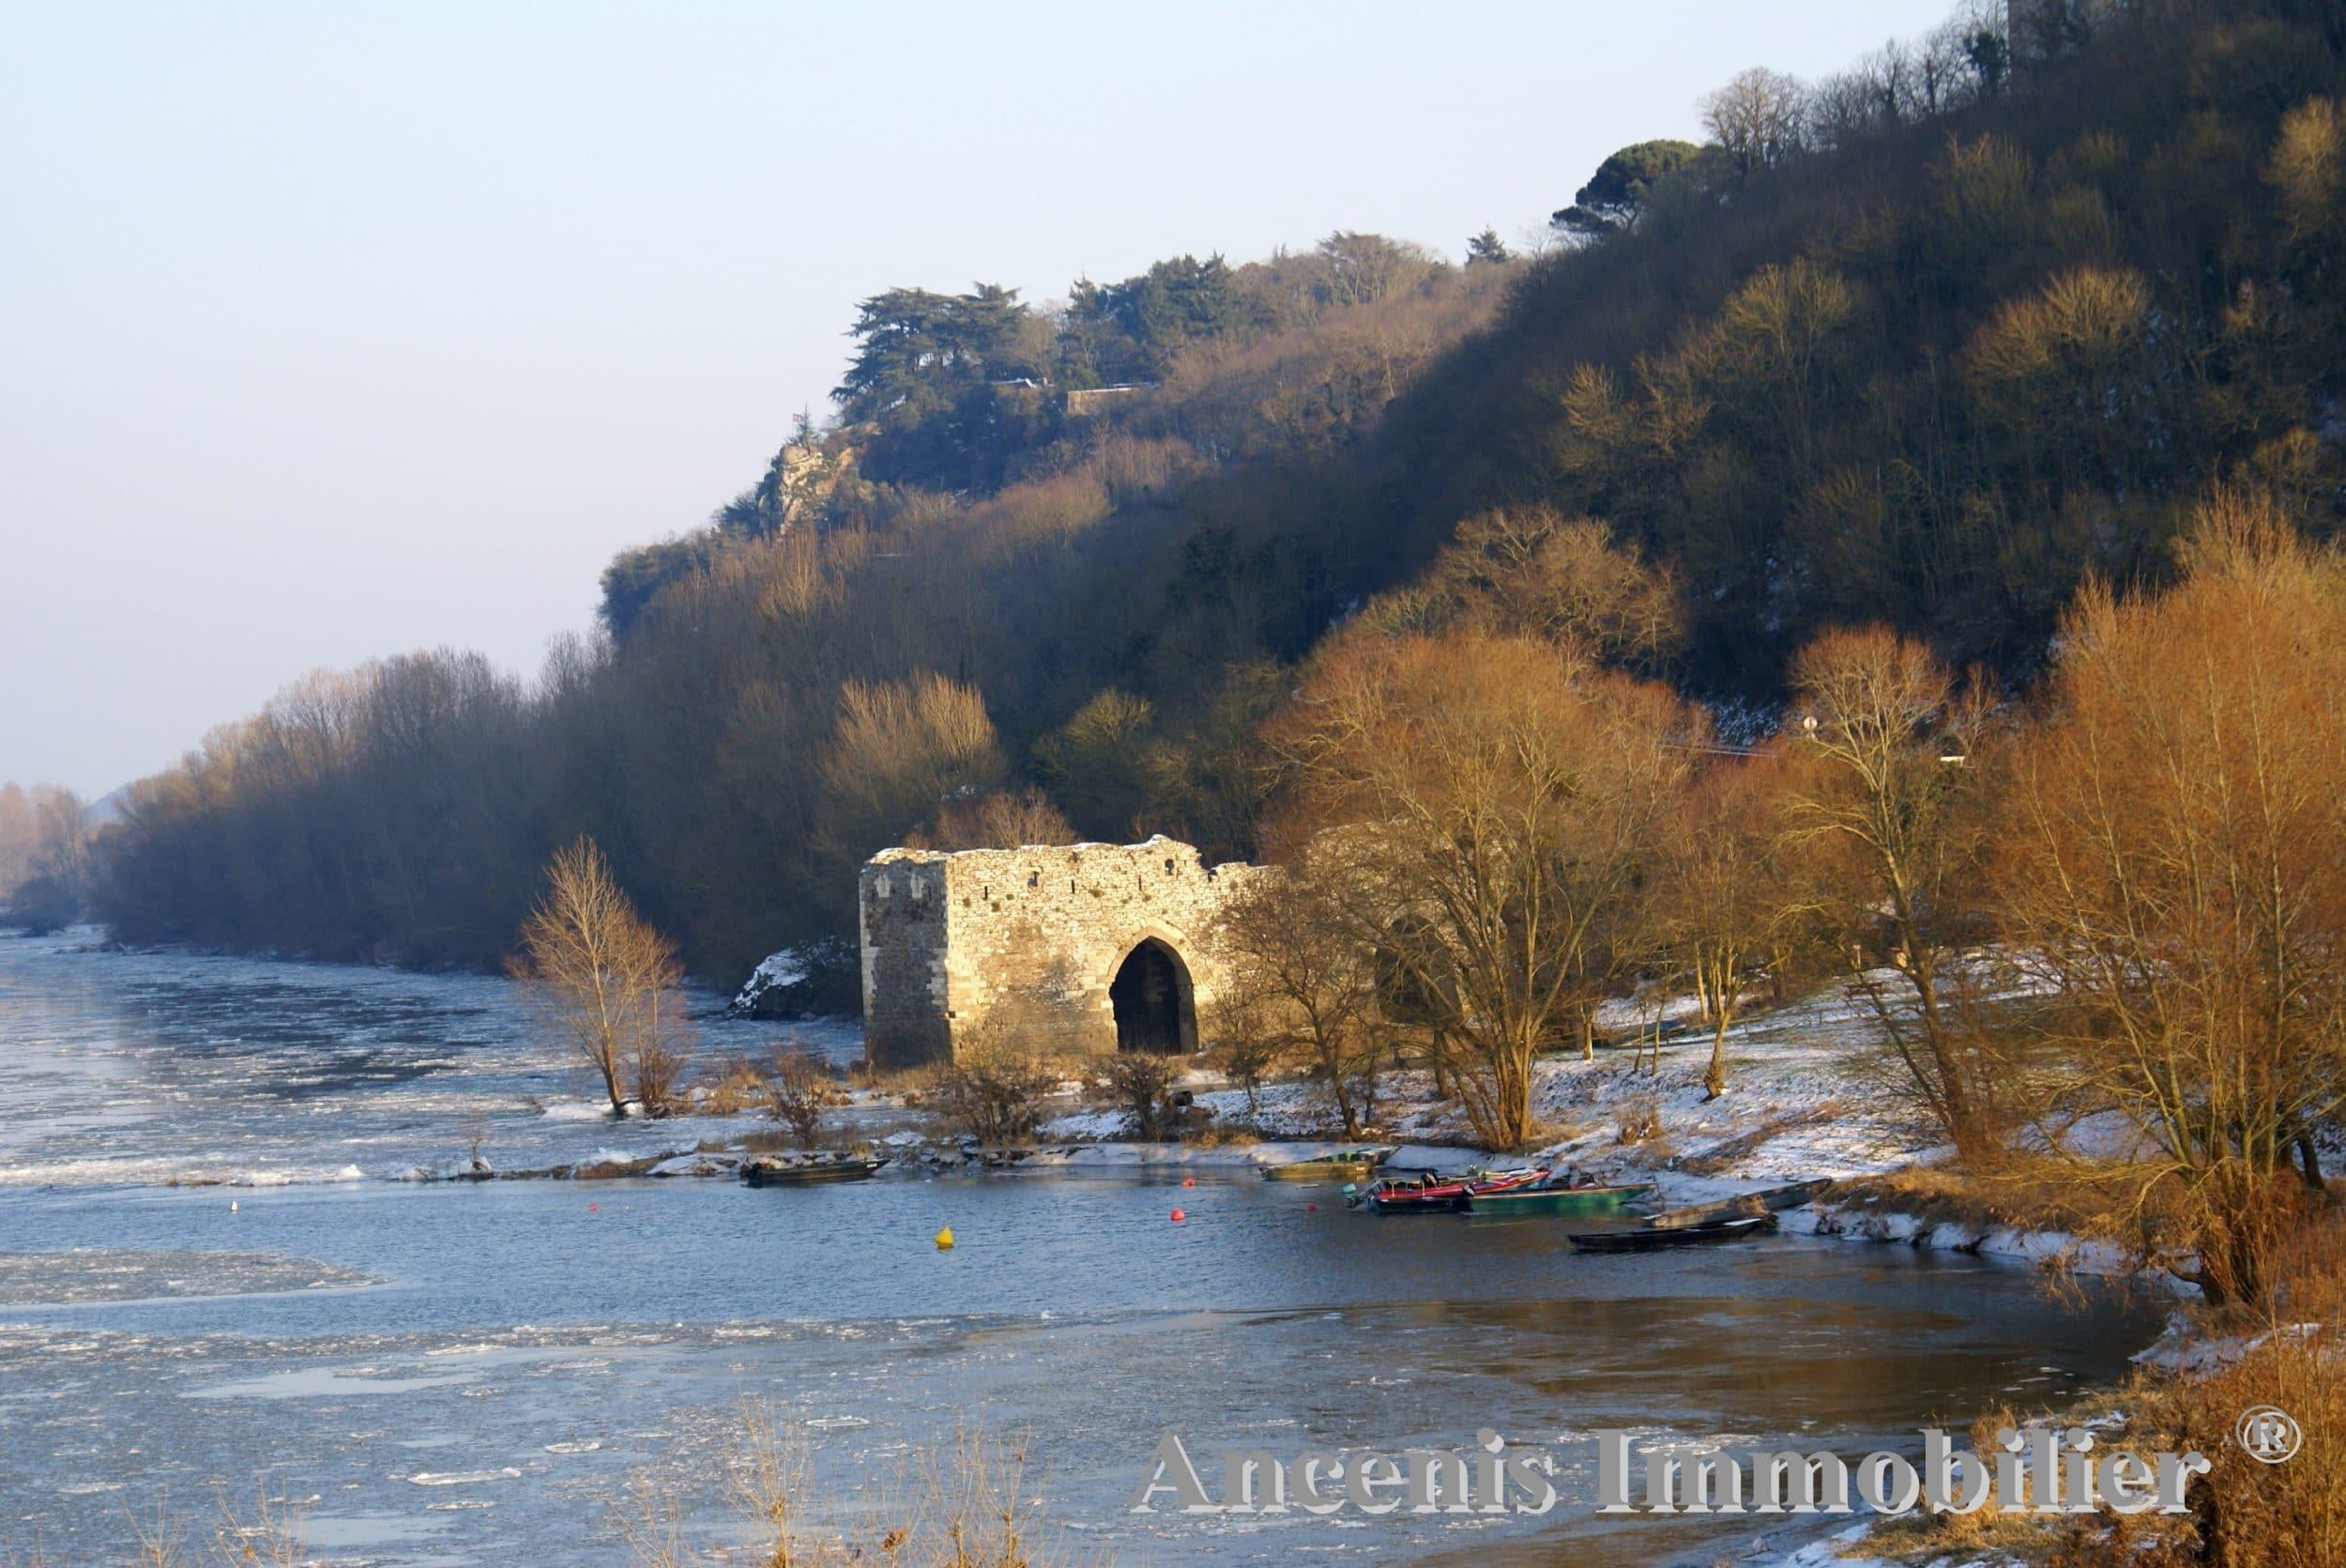 2012-02-10-Champtoceaux-Moulin-pendu-Loire-embacle